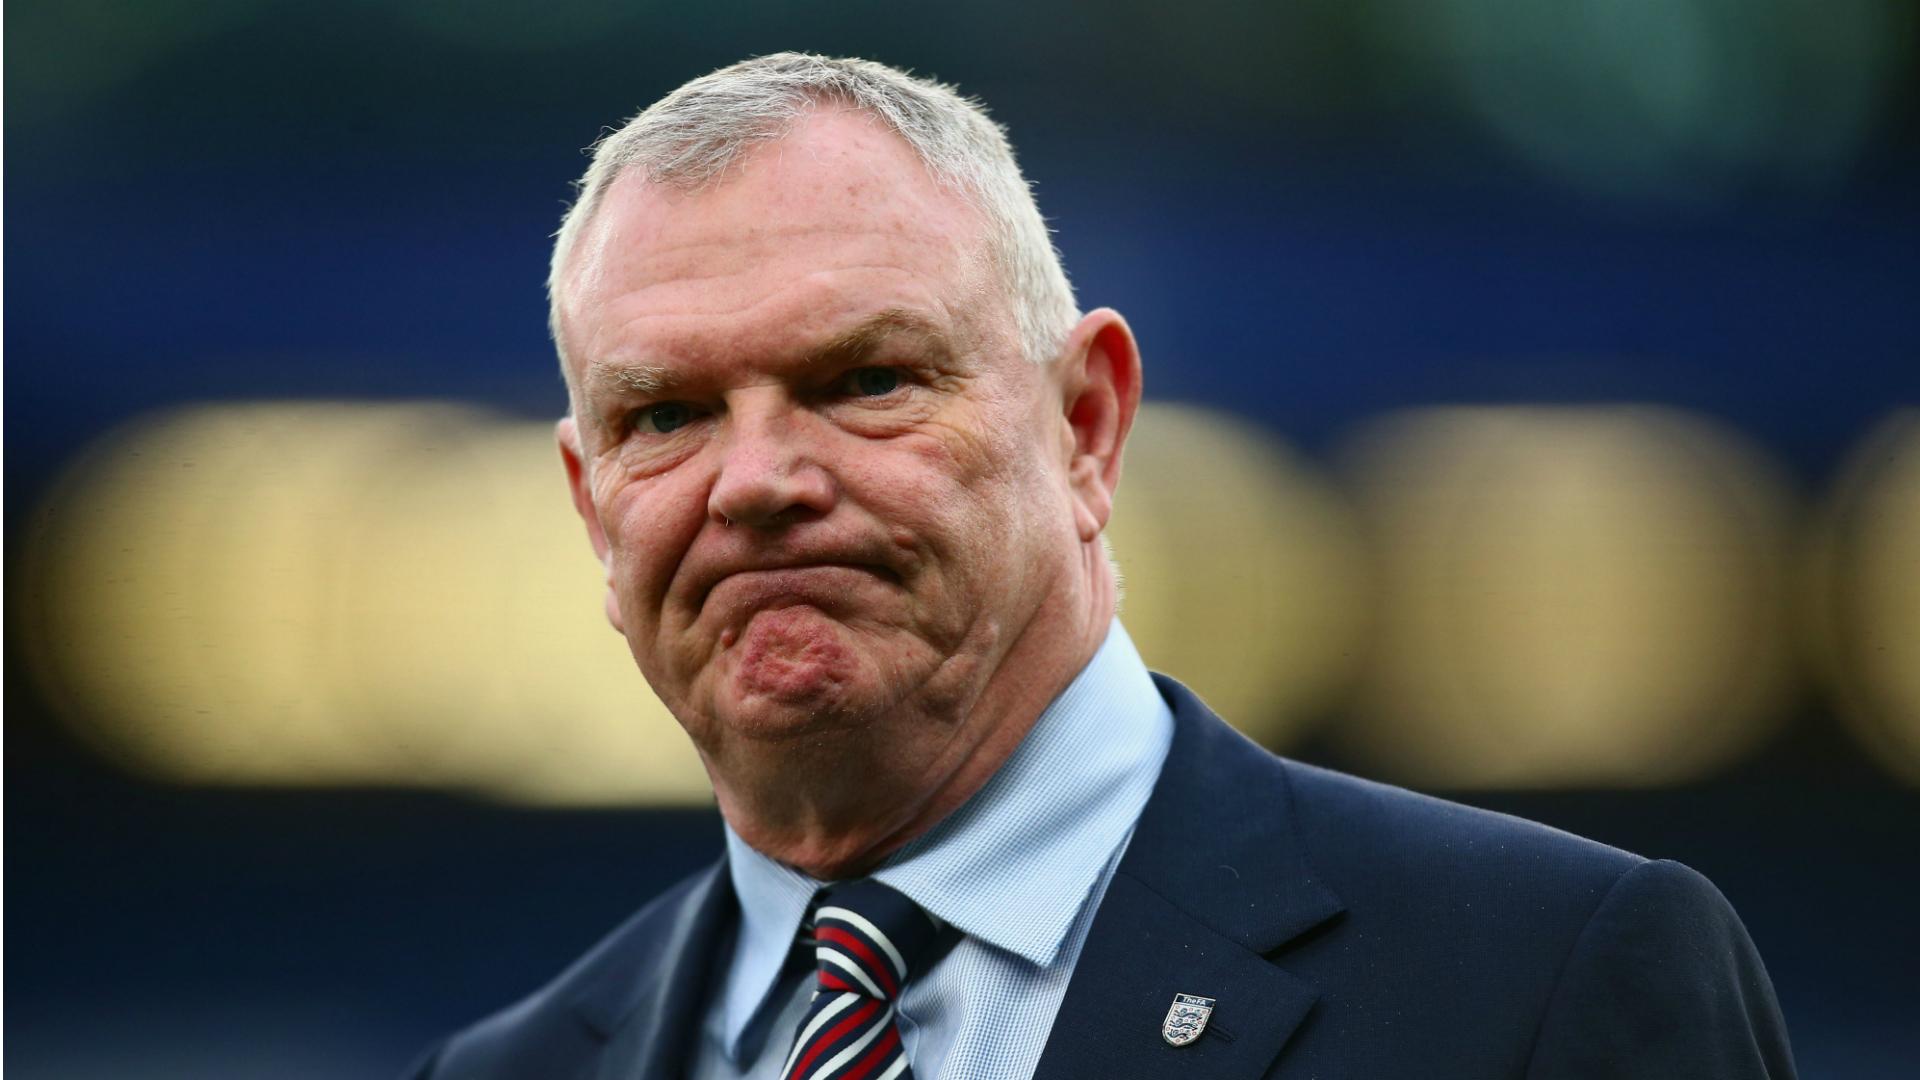 Coronavirus: FA boss Clarke makes 'save our game' plea as English football faces deepest crisis